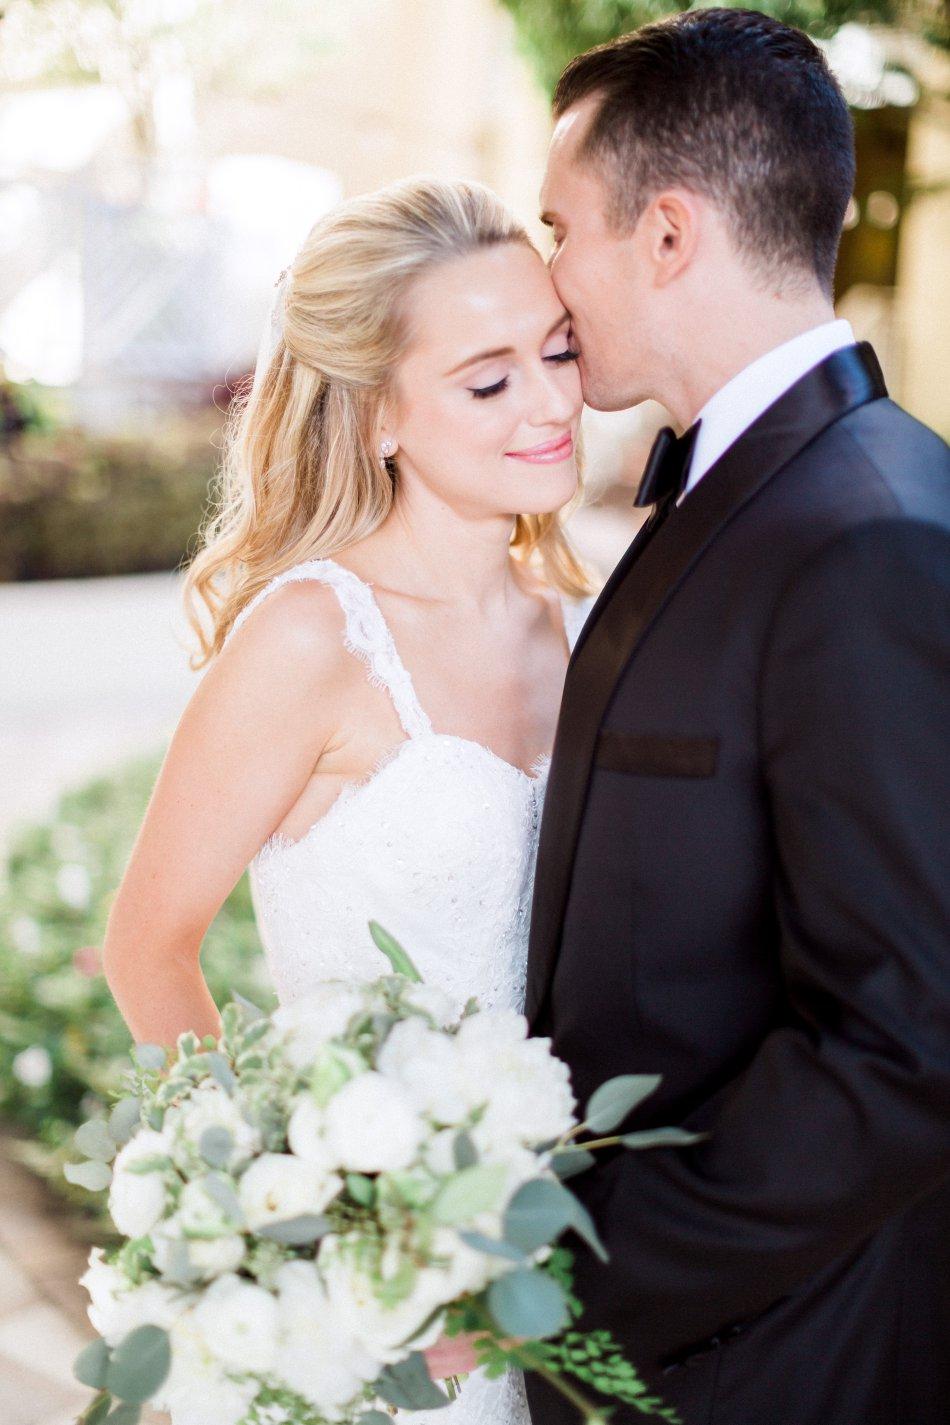 coconut-point-hyatt-wedding-naples-wedding-photography_0596.jpg